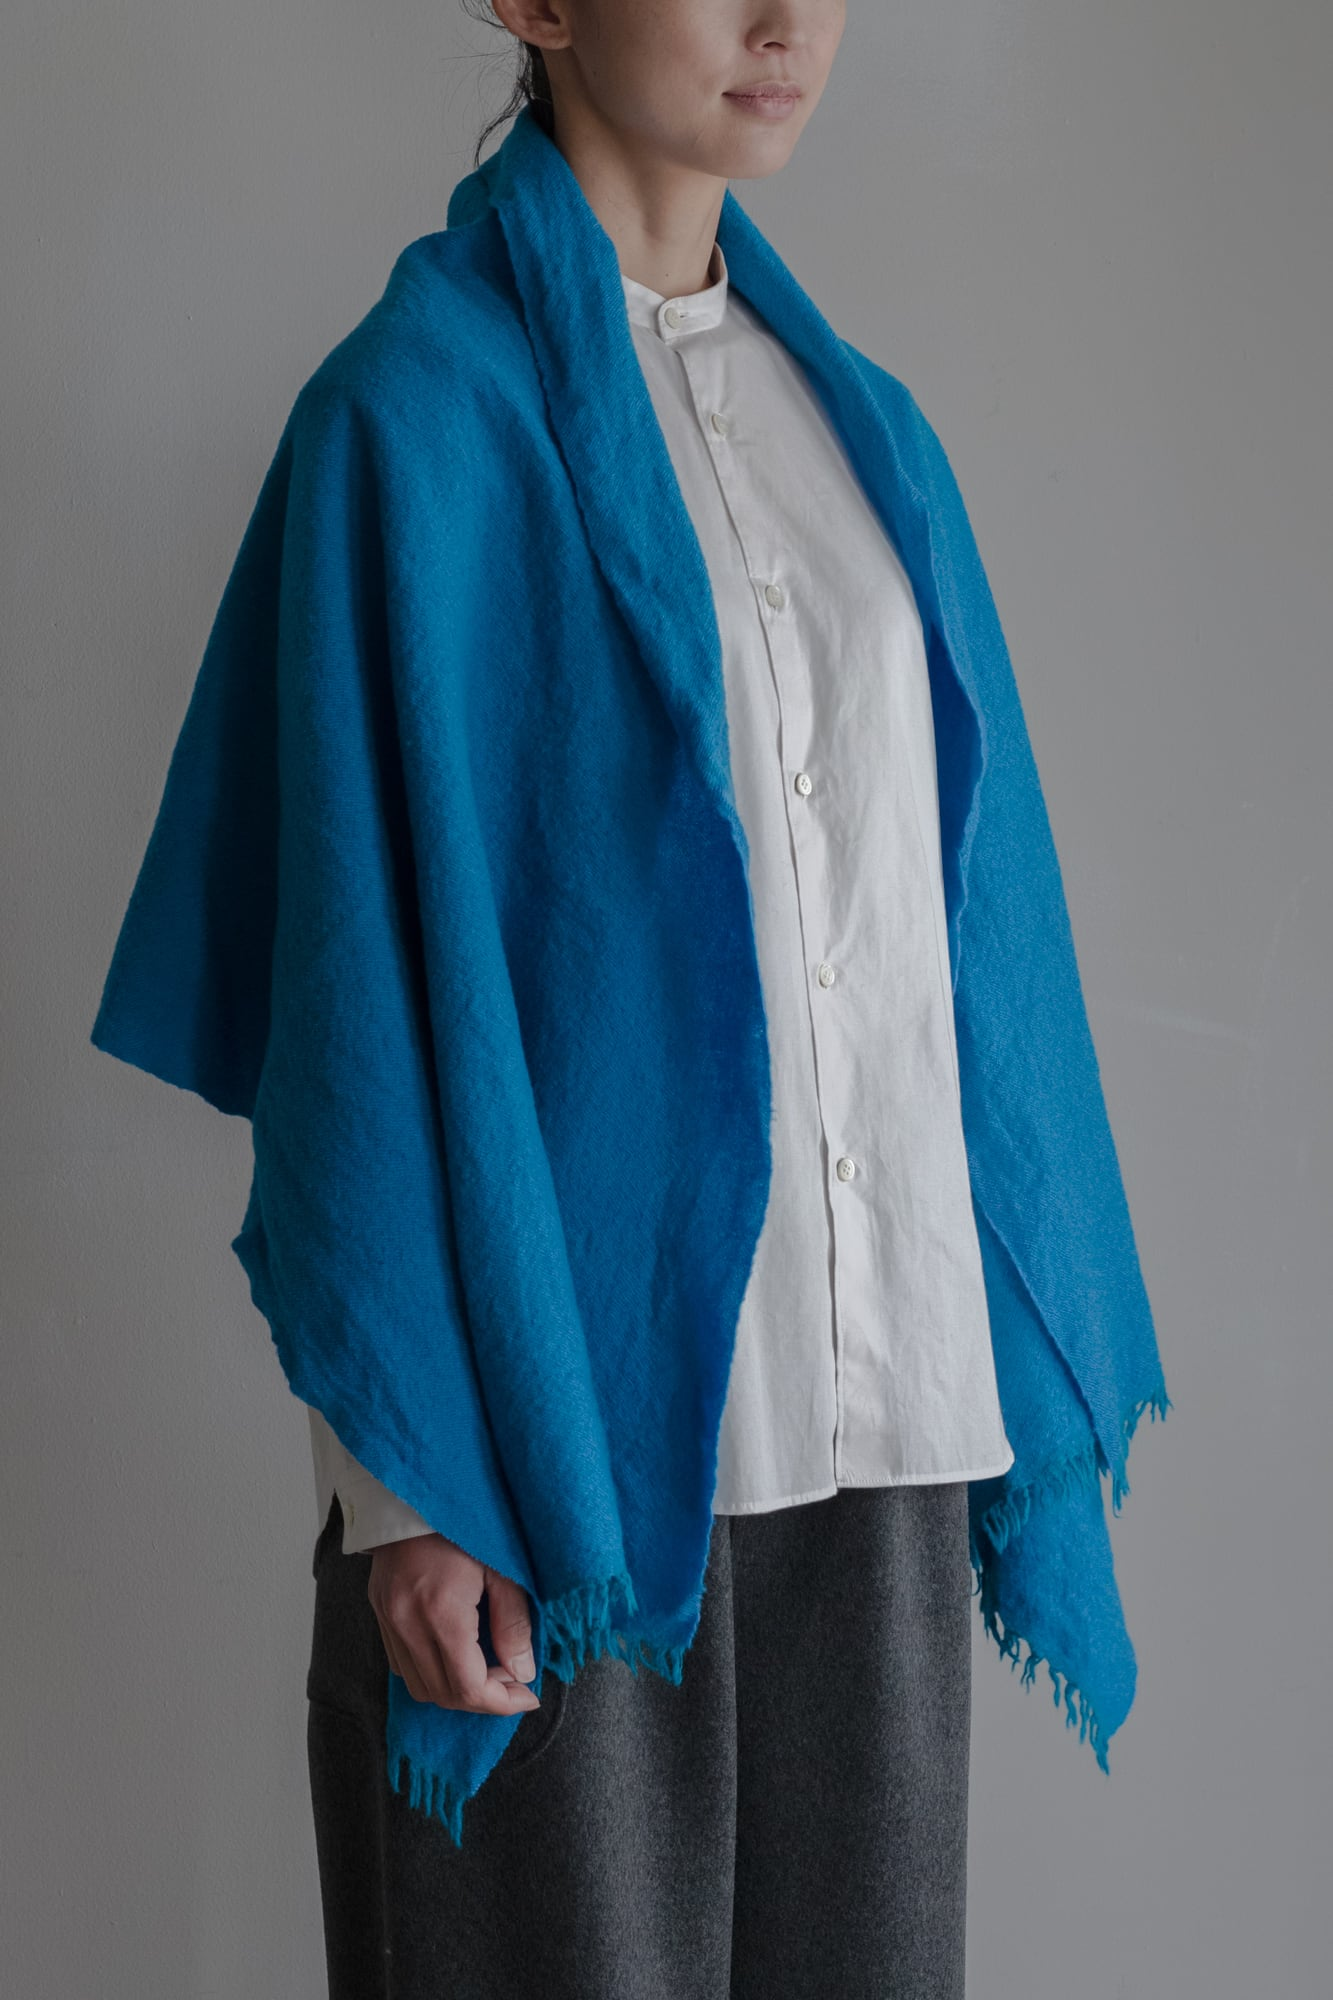 01603-3 chambray muffler / turquoise,lightblue